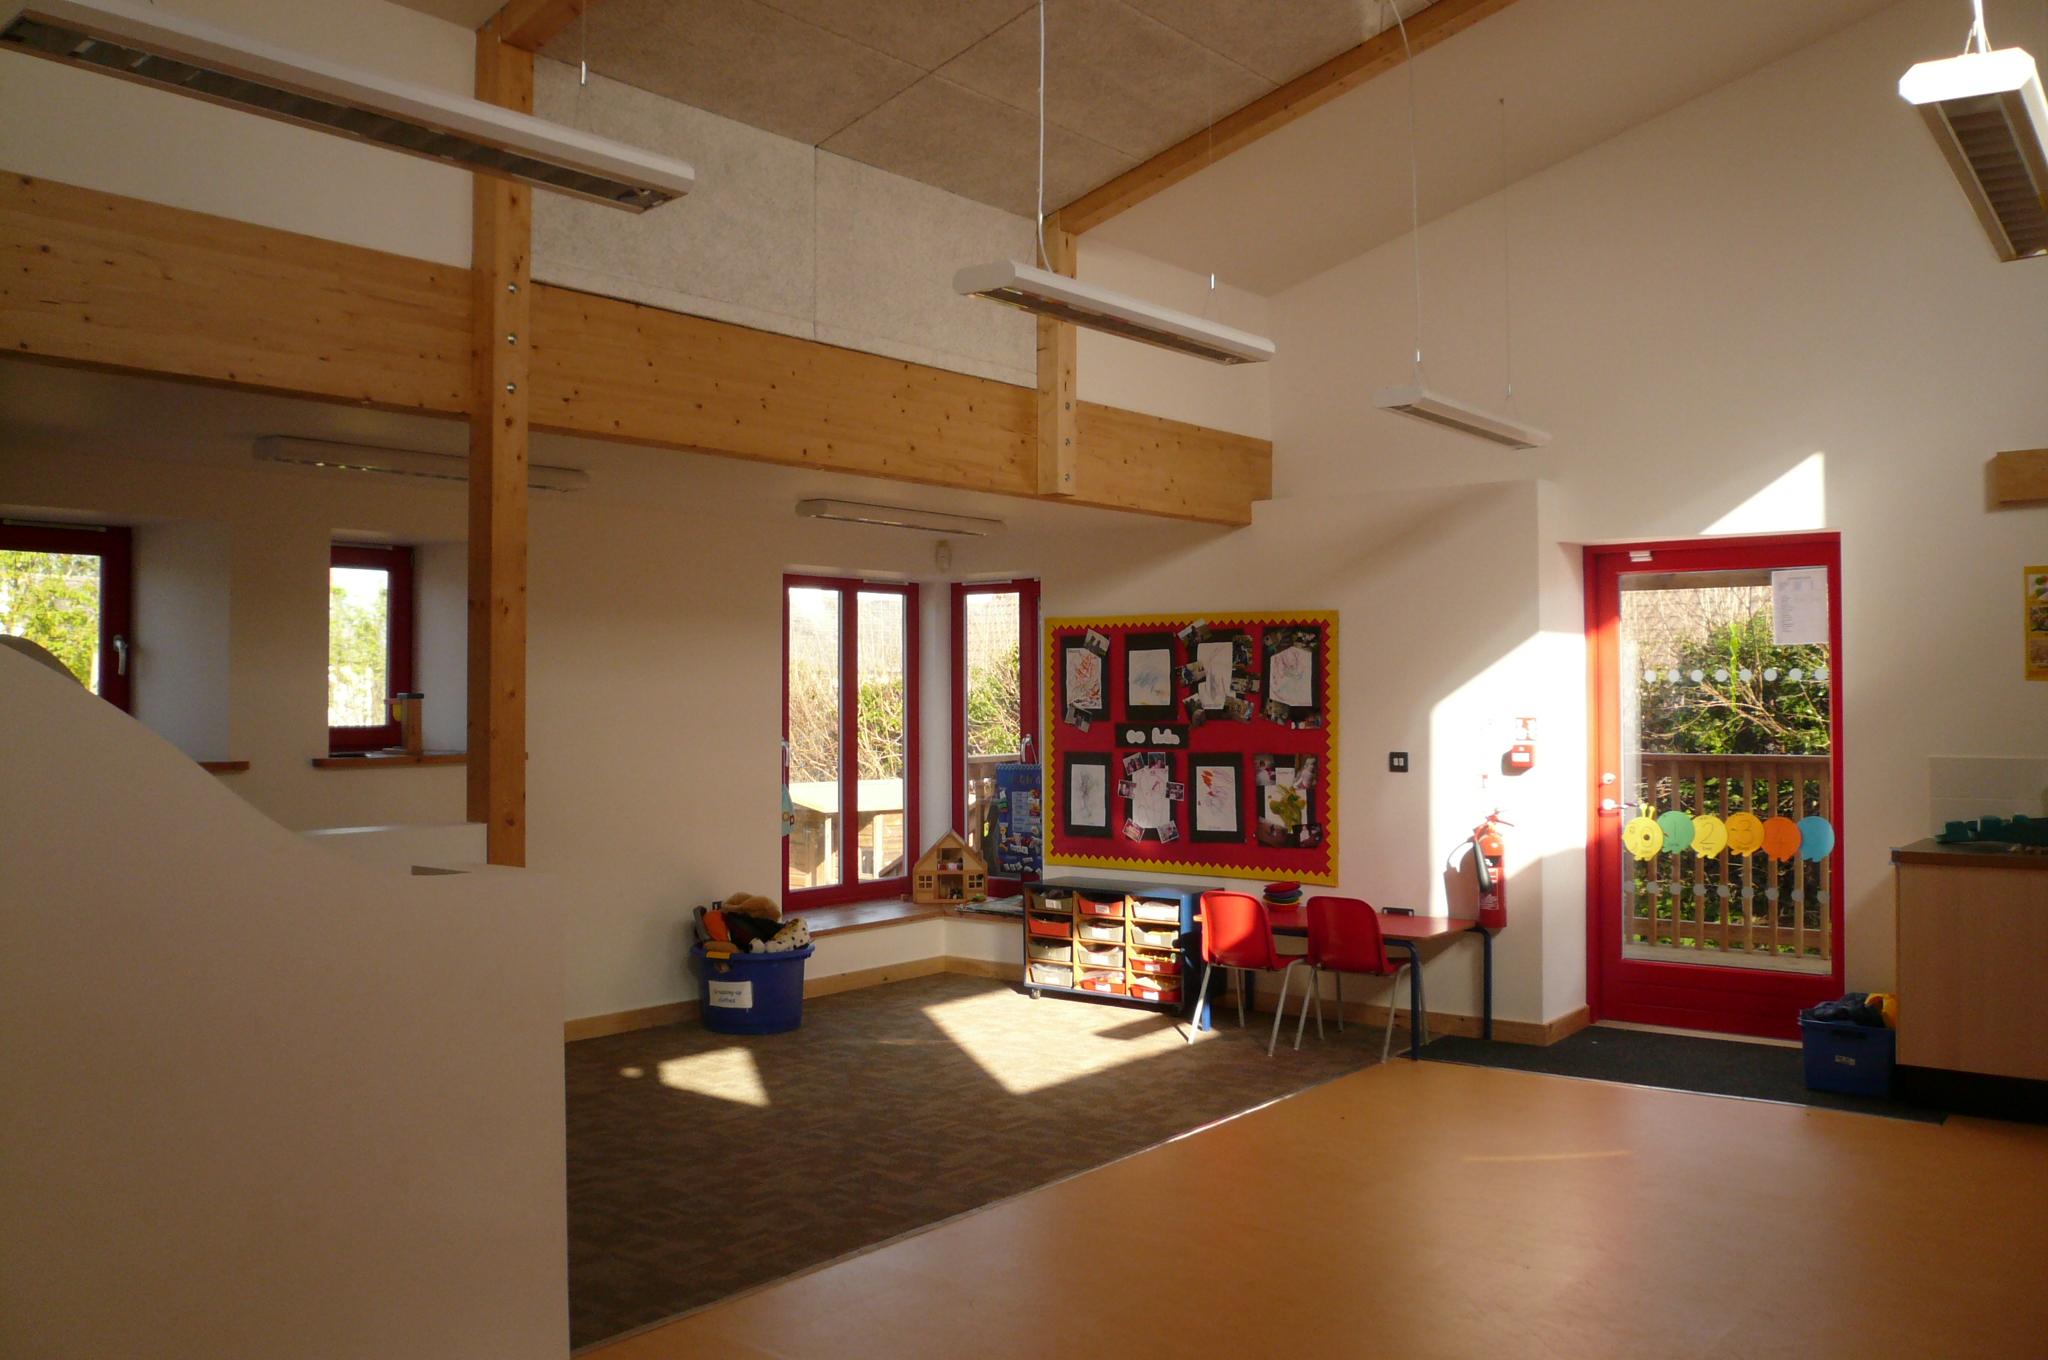 Egloskerry Classroom 2